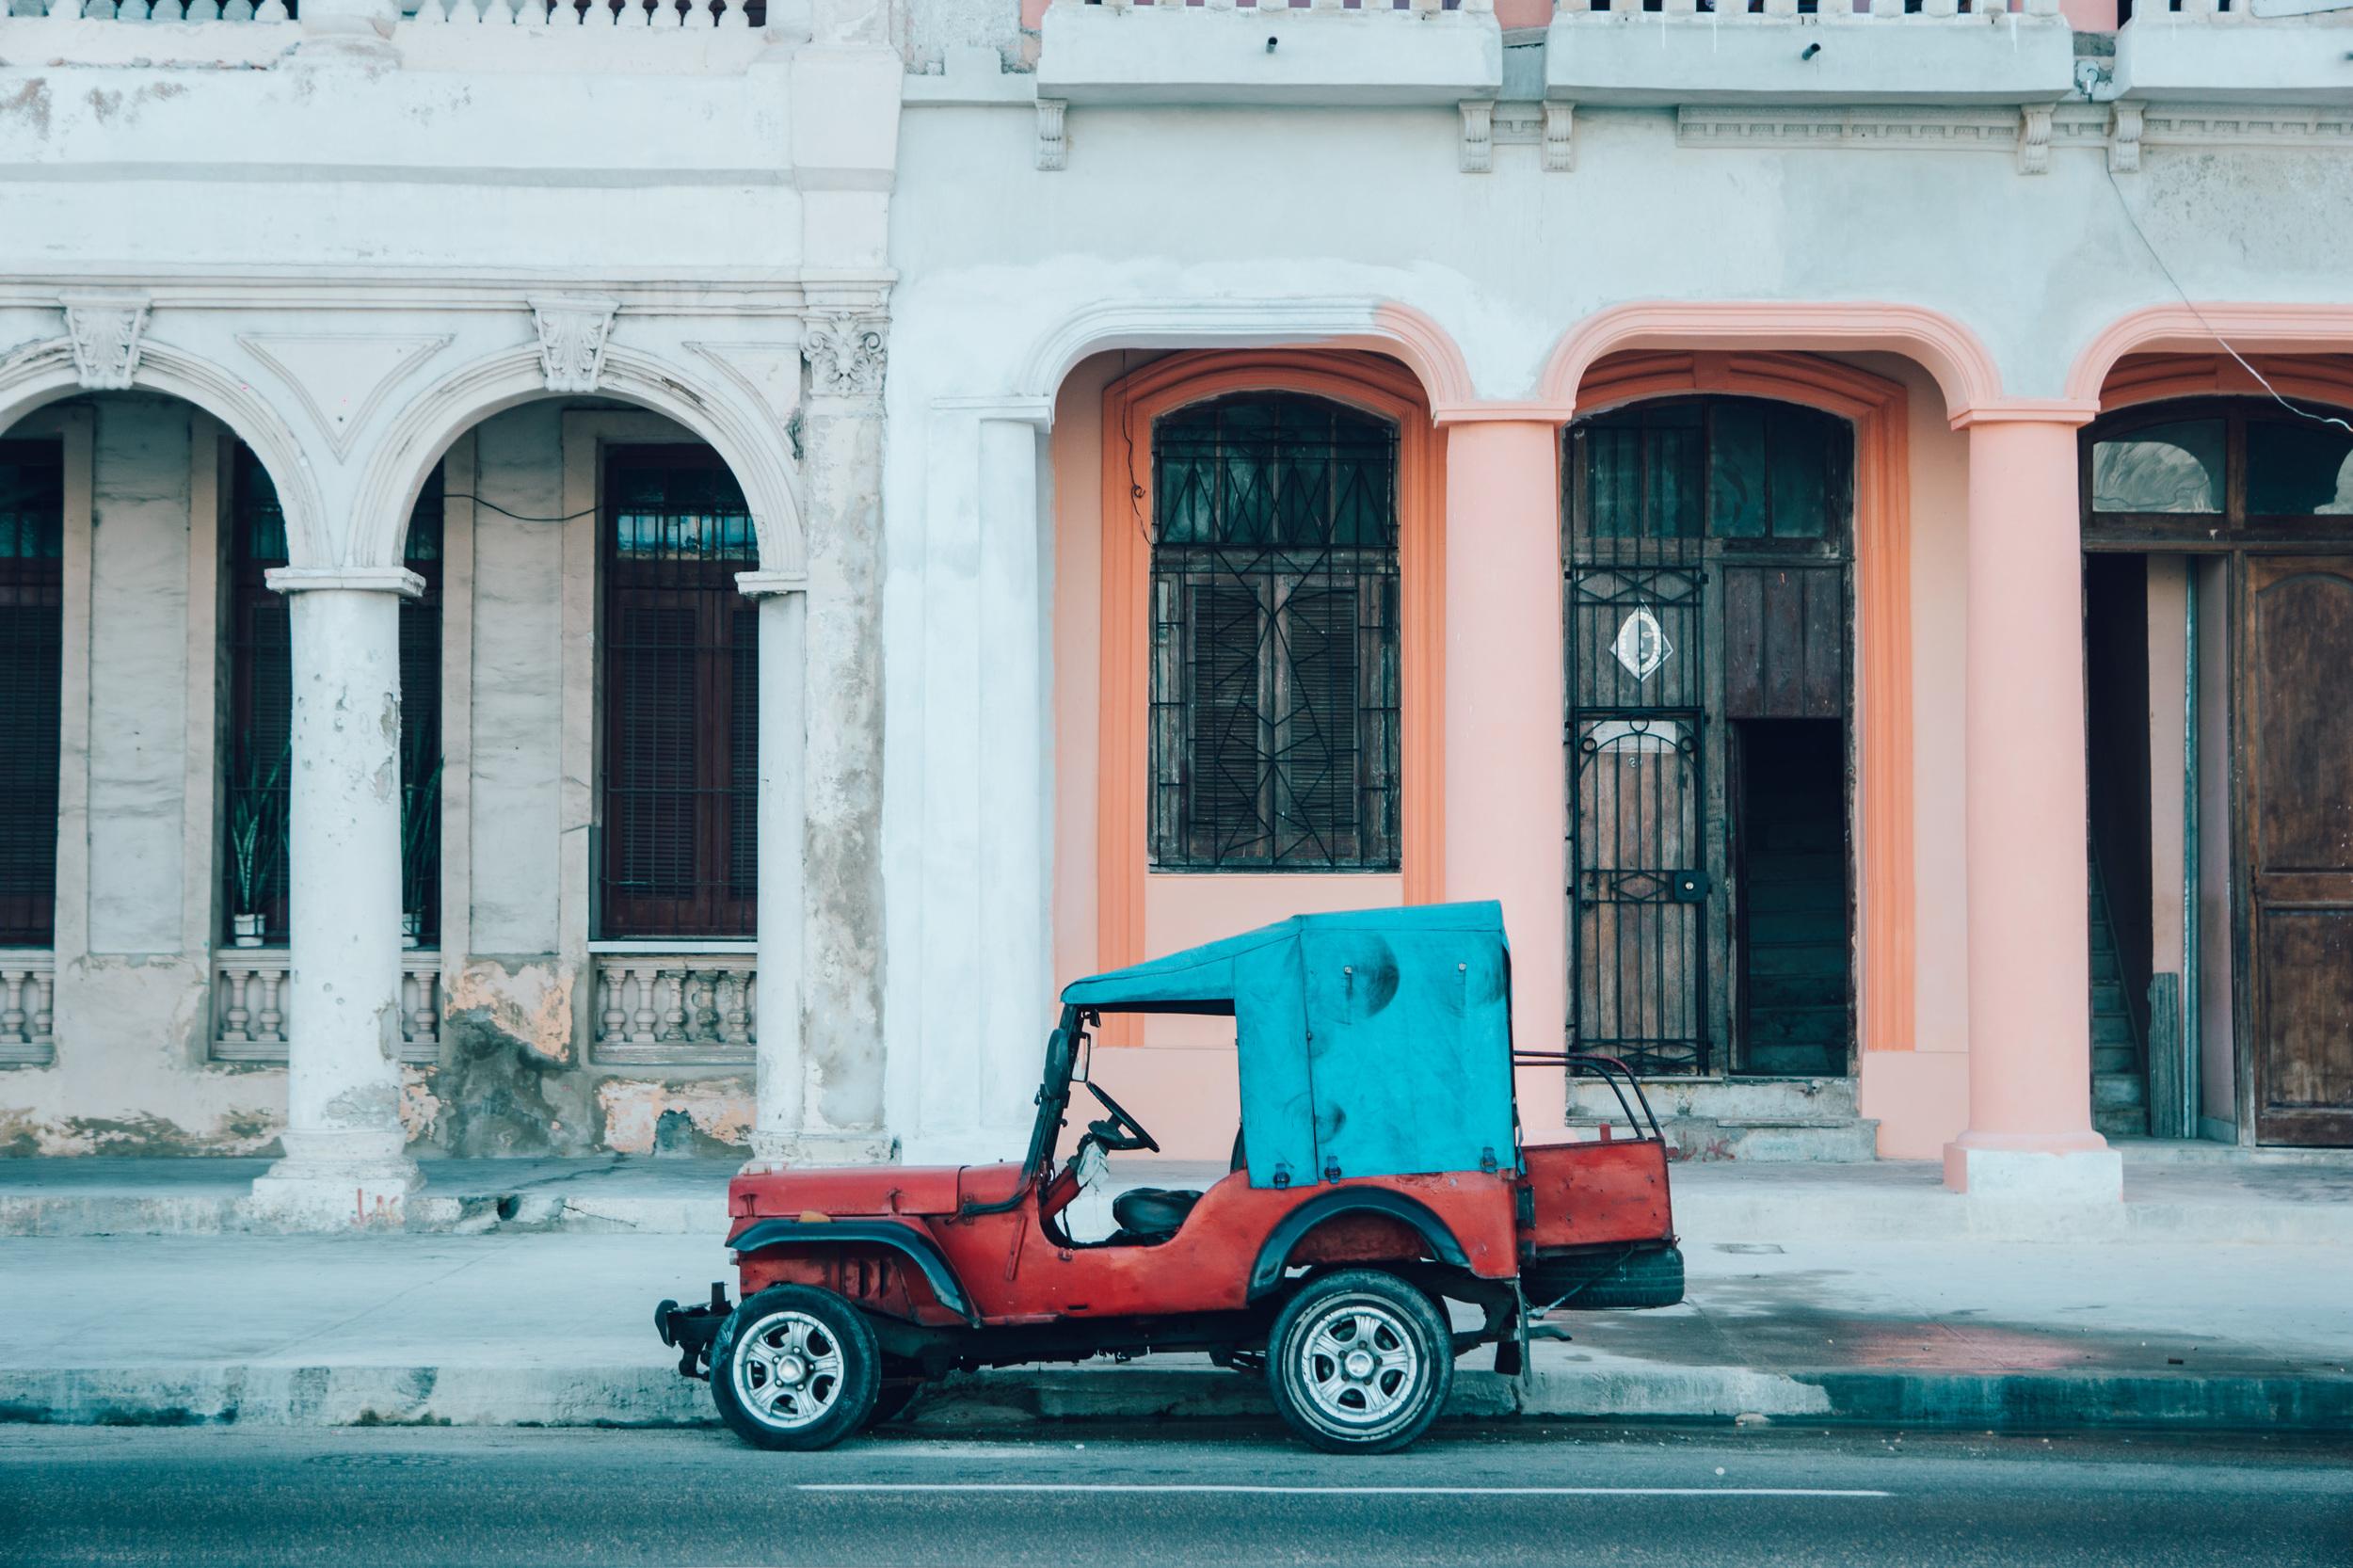 DeClaro-Photography-Cuba-02713.jpg